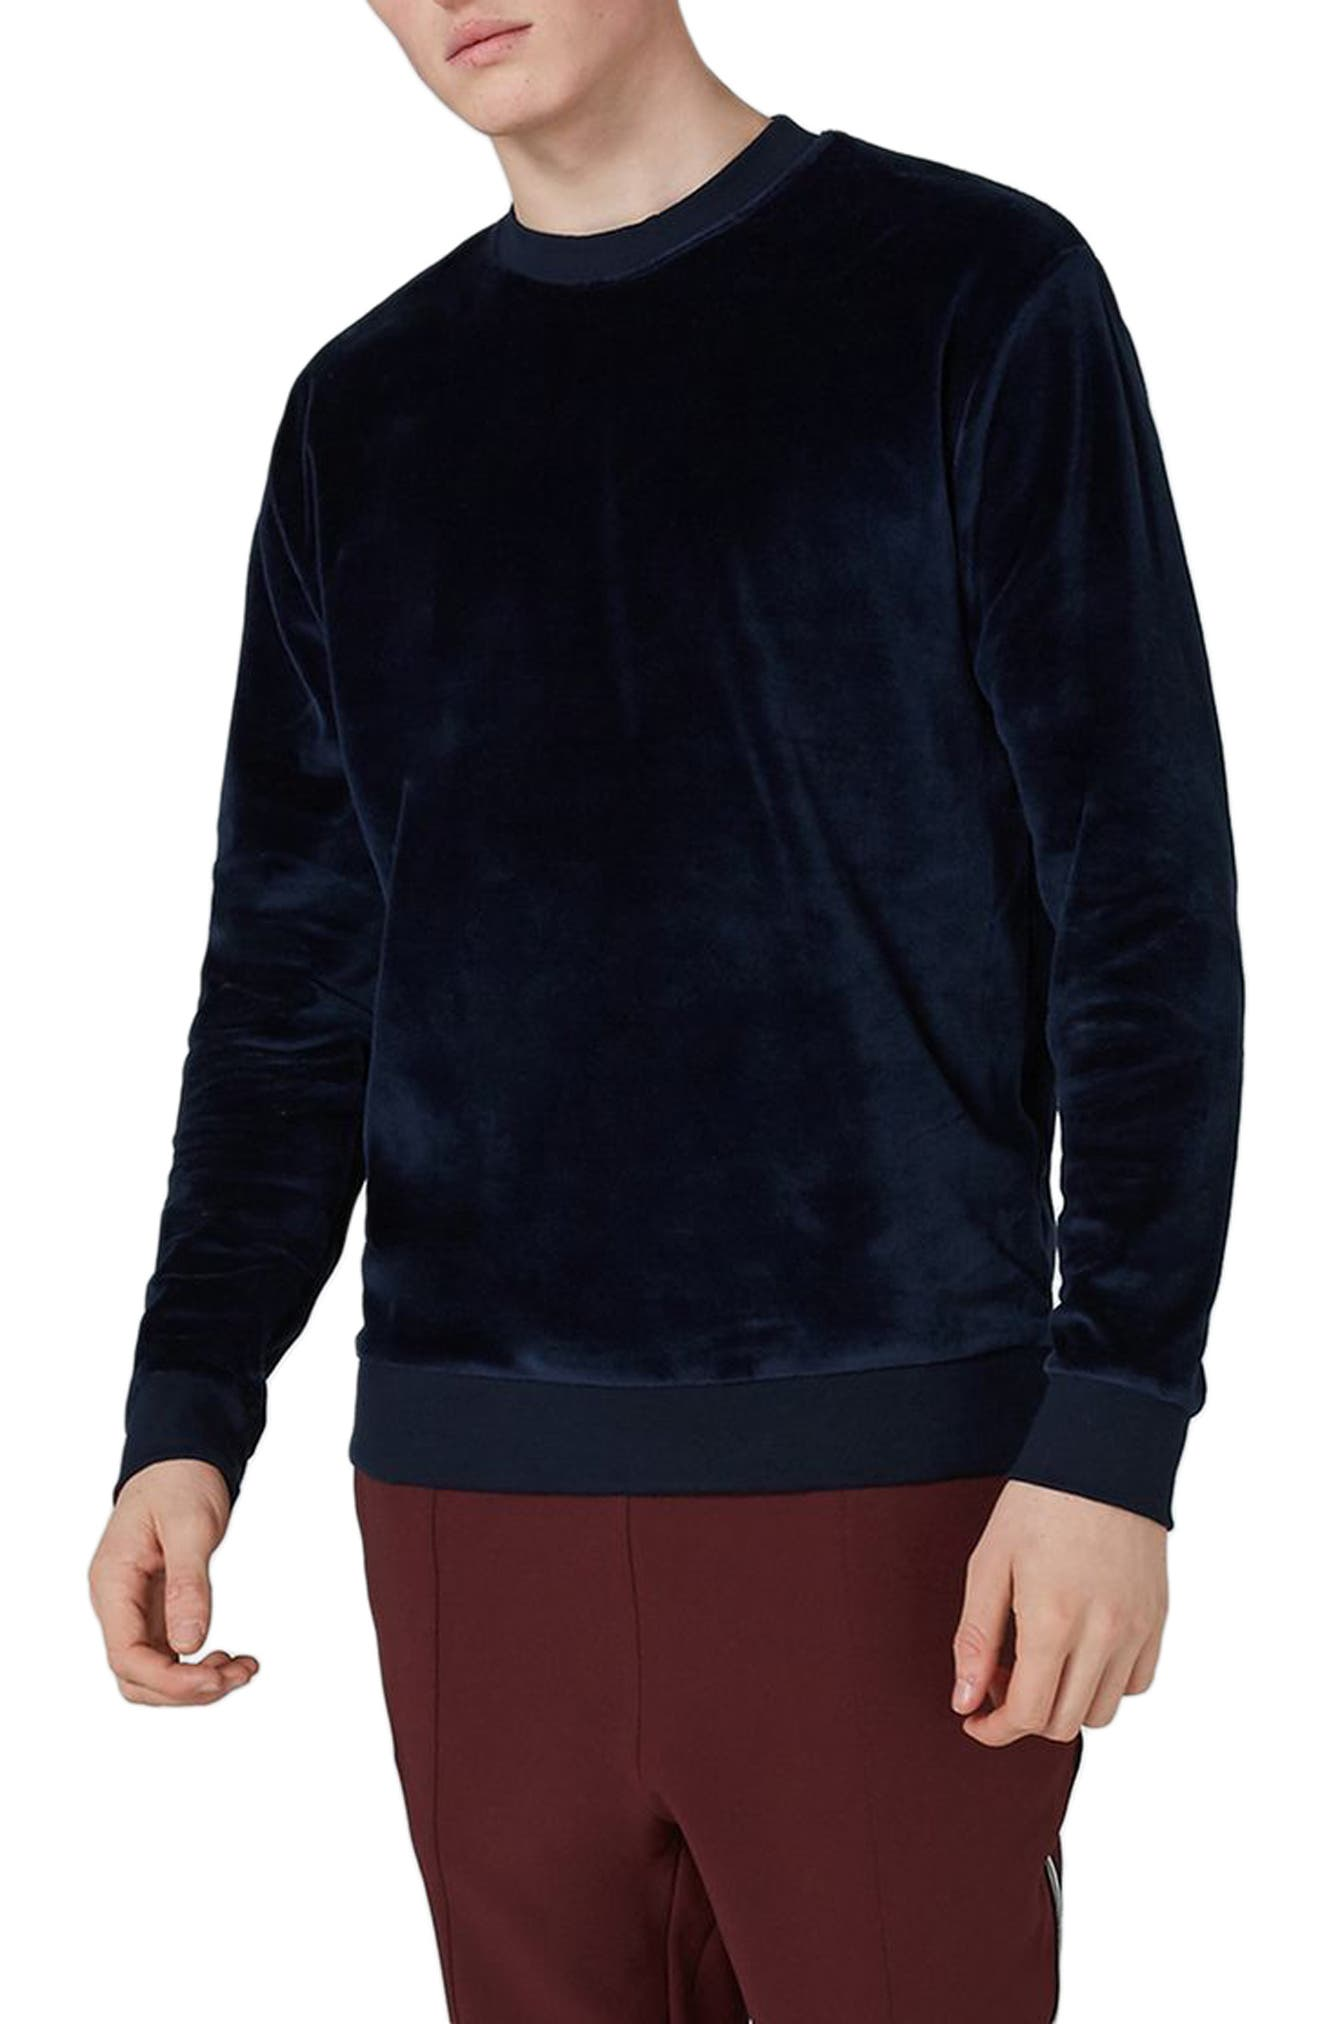 Velour Sweatshirt,                             Main thumbnail 1, color,                             401